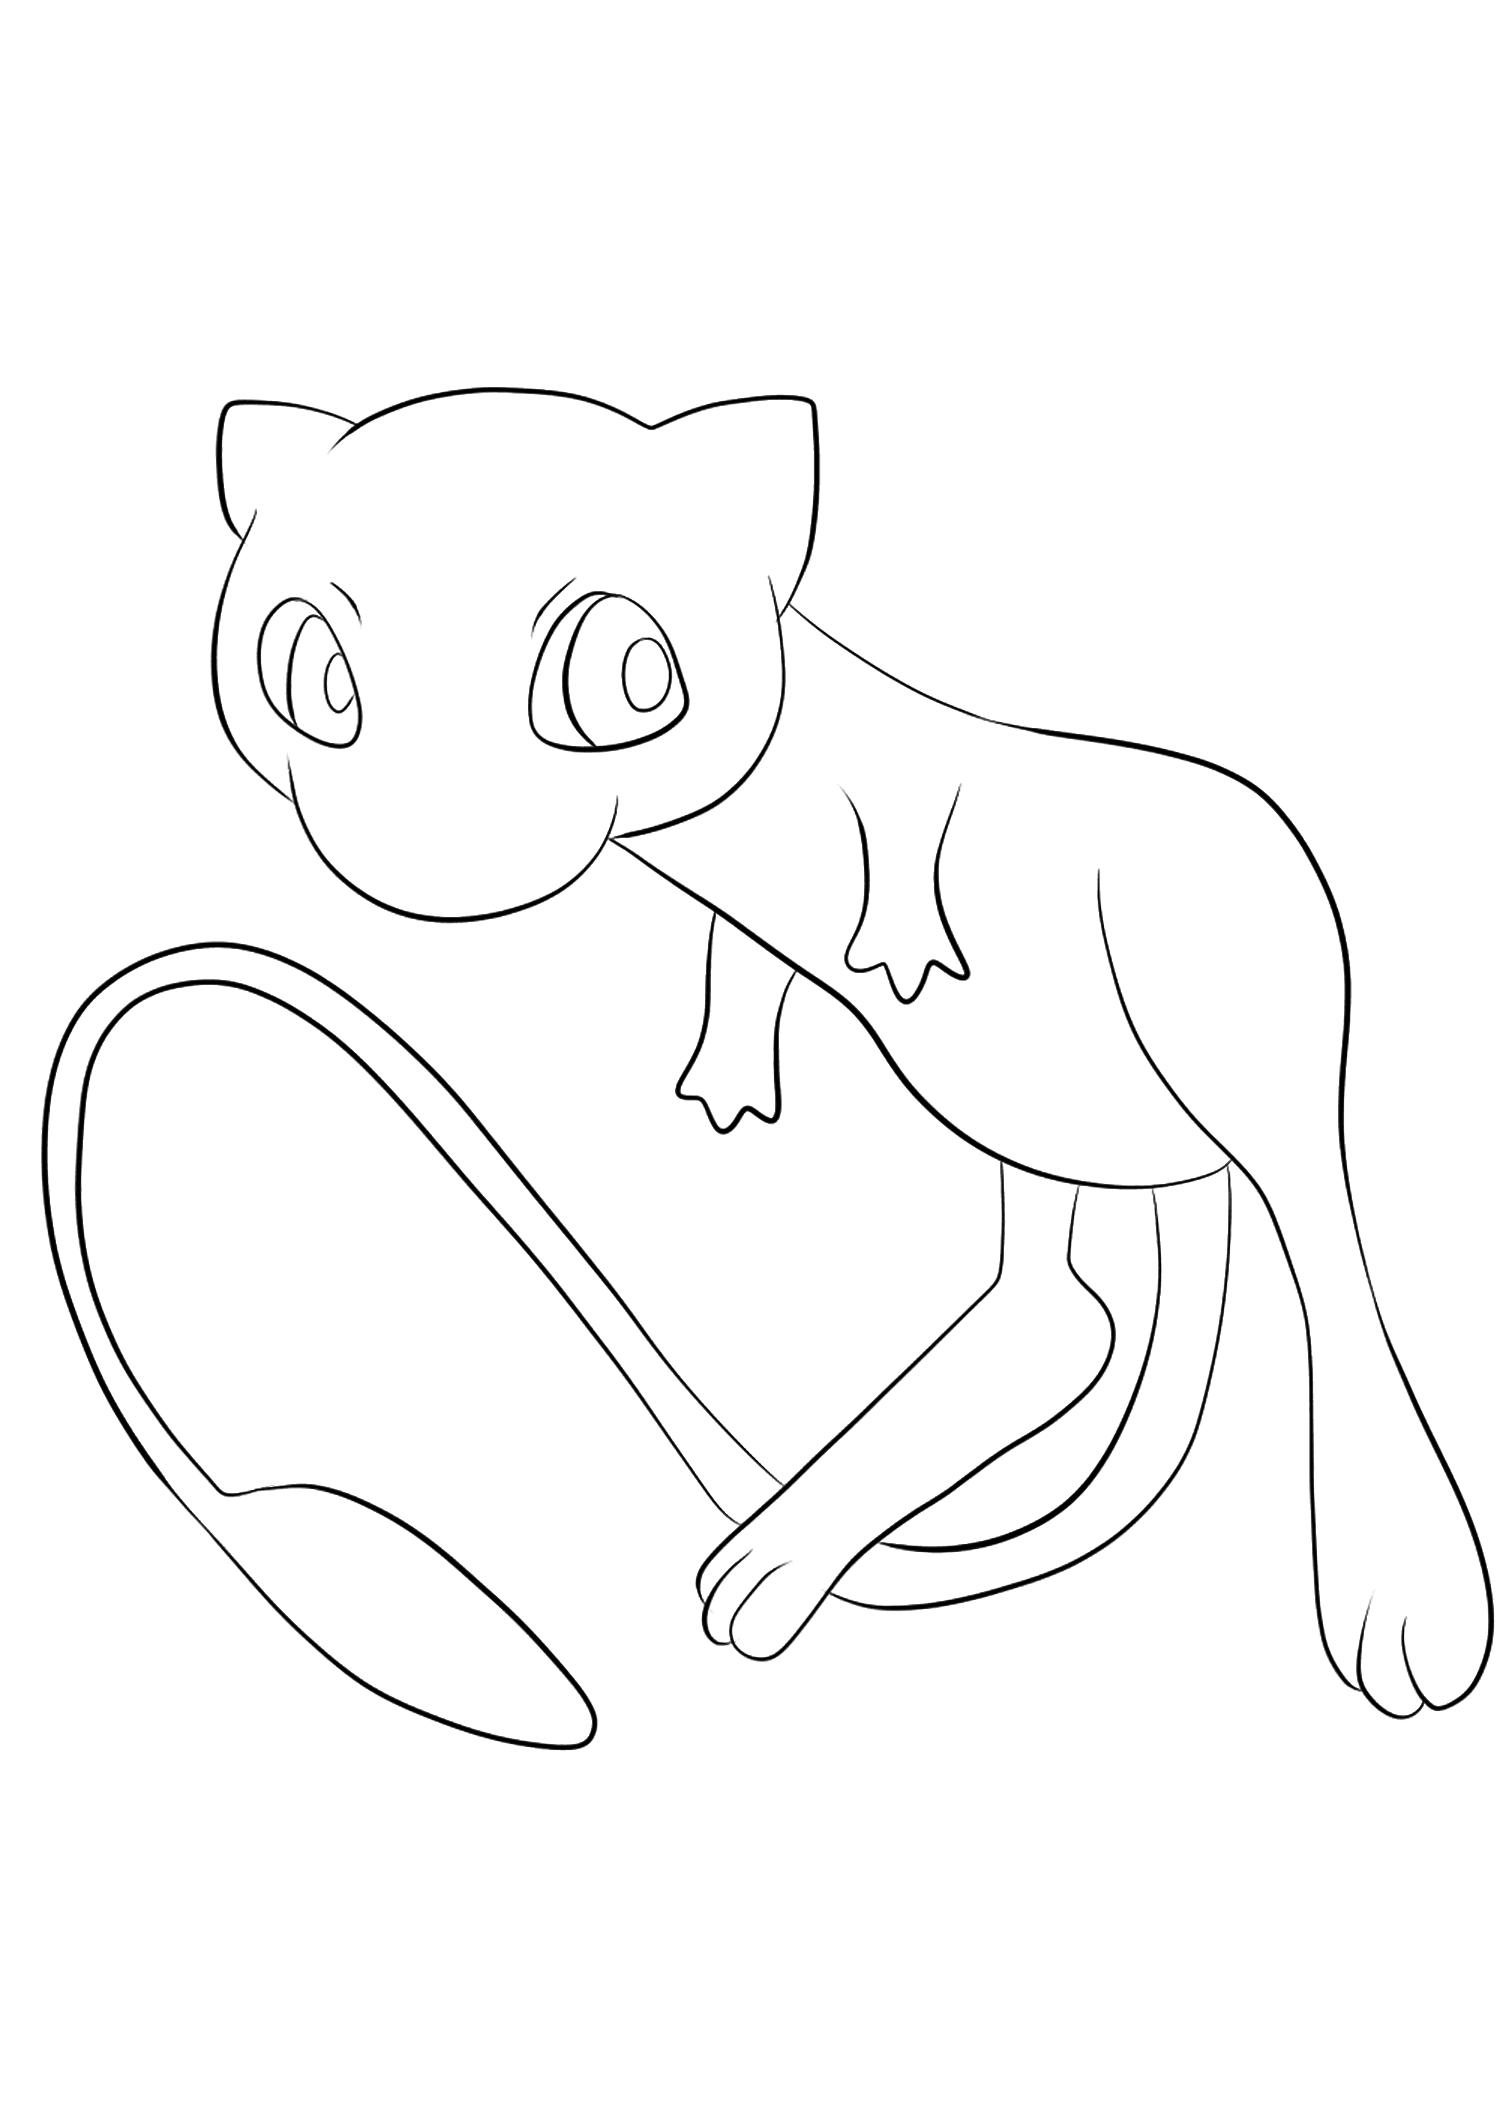 <b>Mew</b> (No.151) : Pokémon de génération II